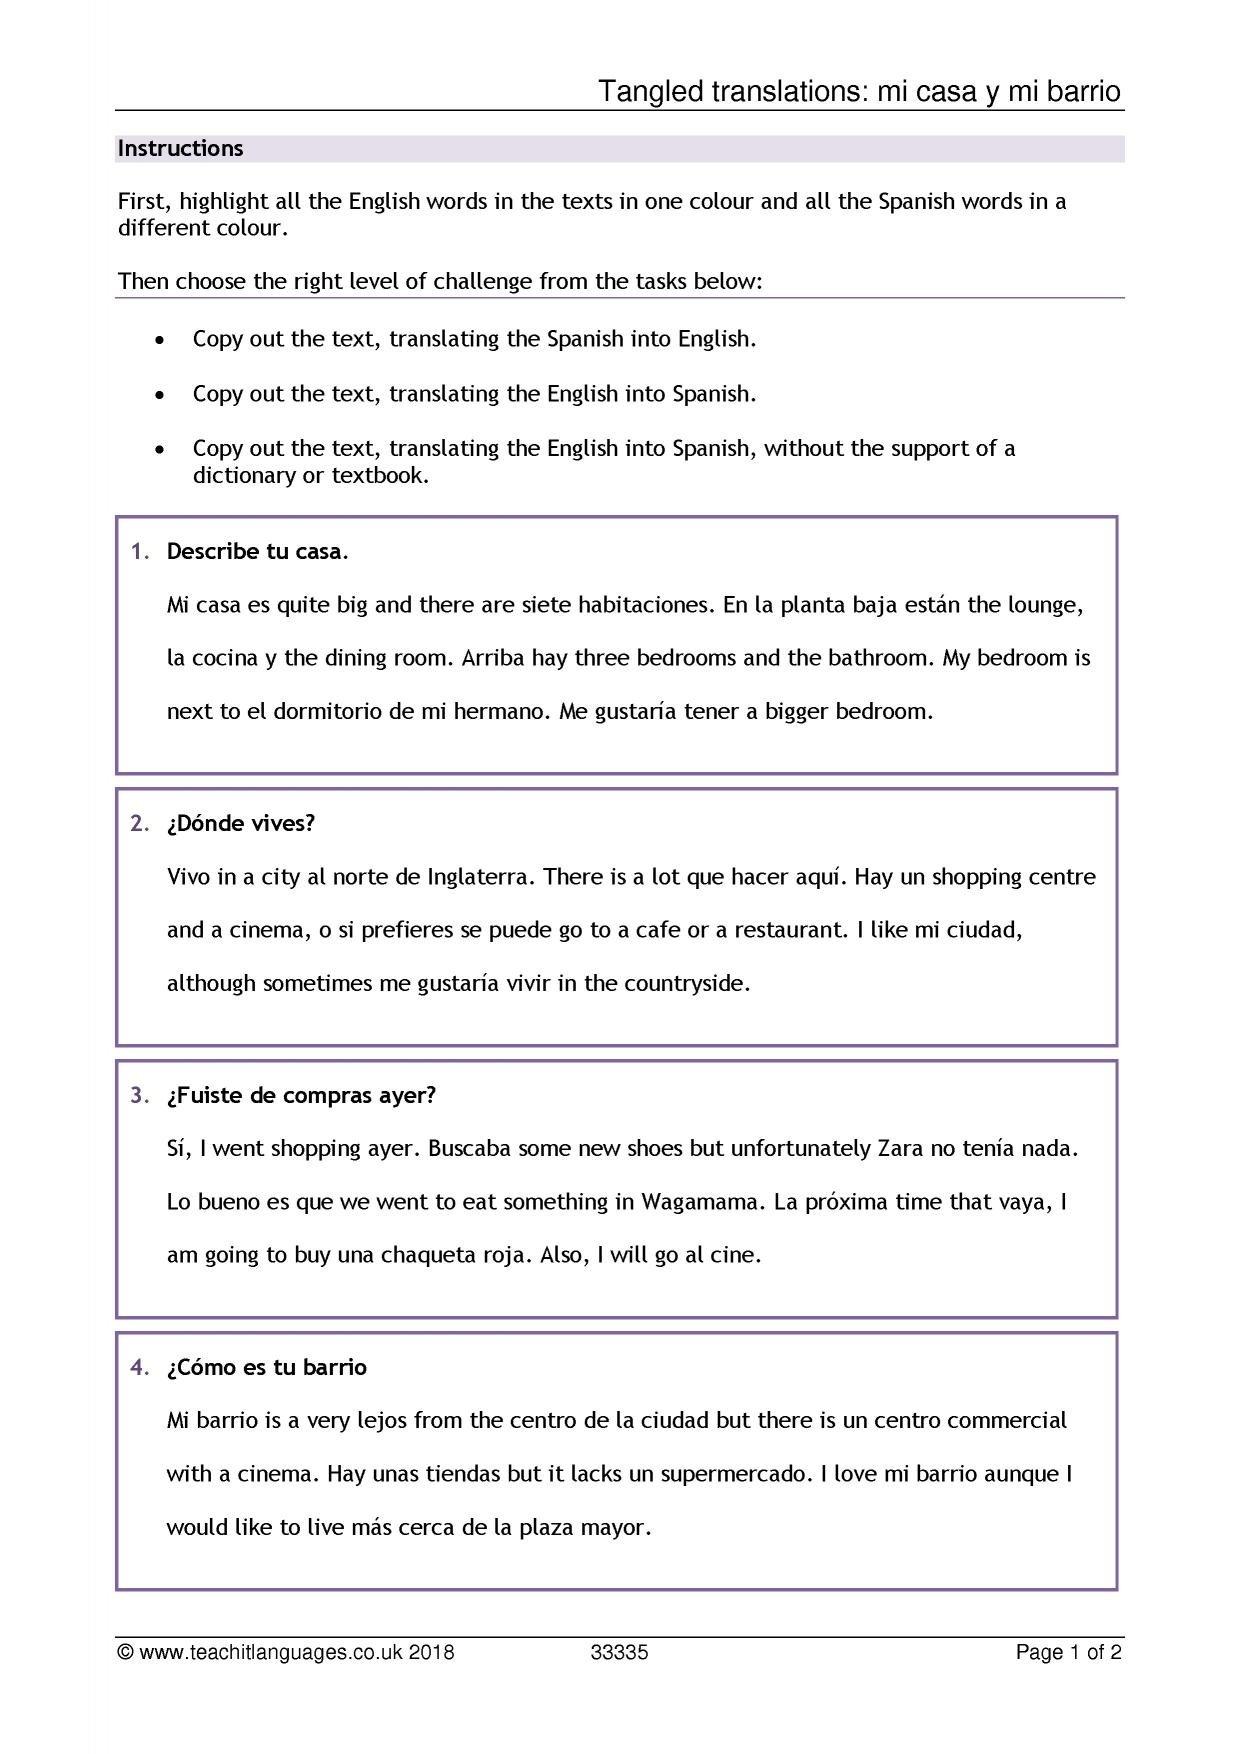 Spanish Language Teaching Resources  Teachit Languages Or Spanish Dialogue Practice Worksheets